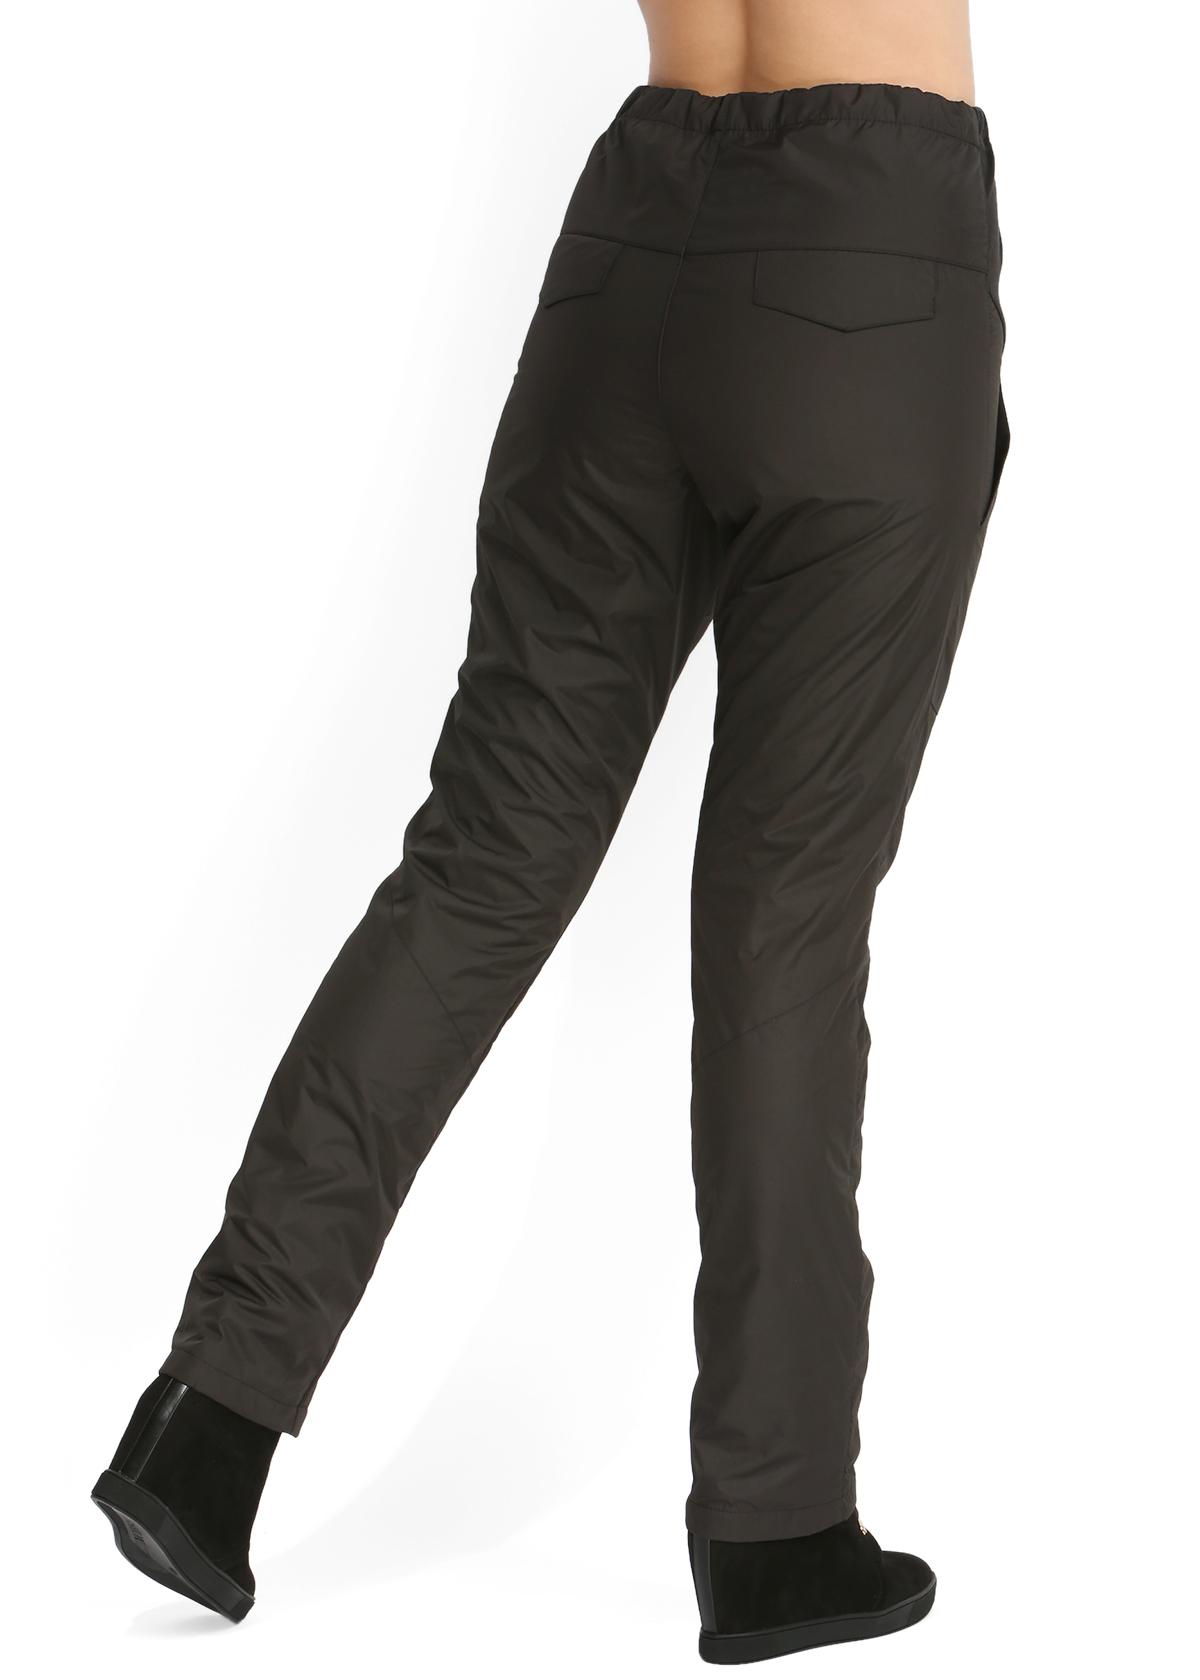 ... MamaMia.by, брюки, джинсы для беременных купить в Минске, в Беларуси, edad4c9879a